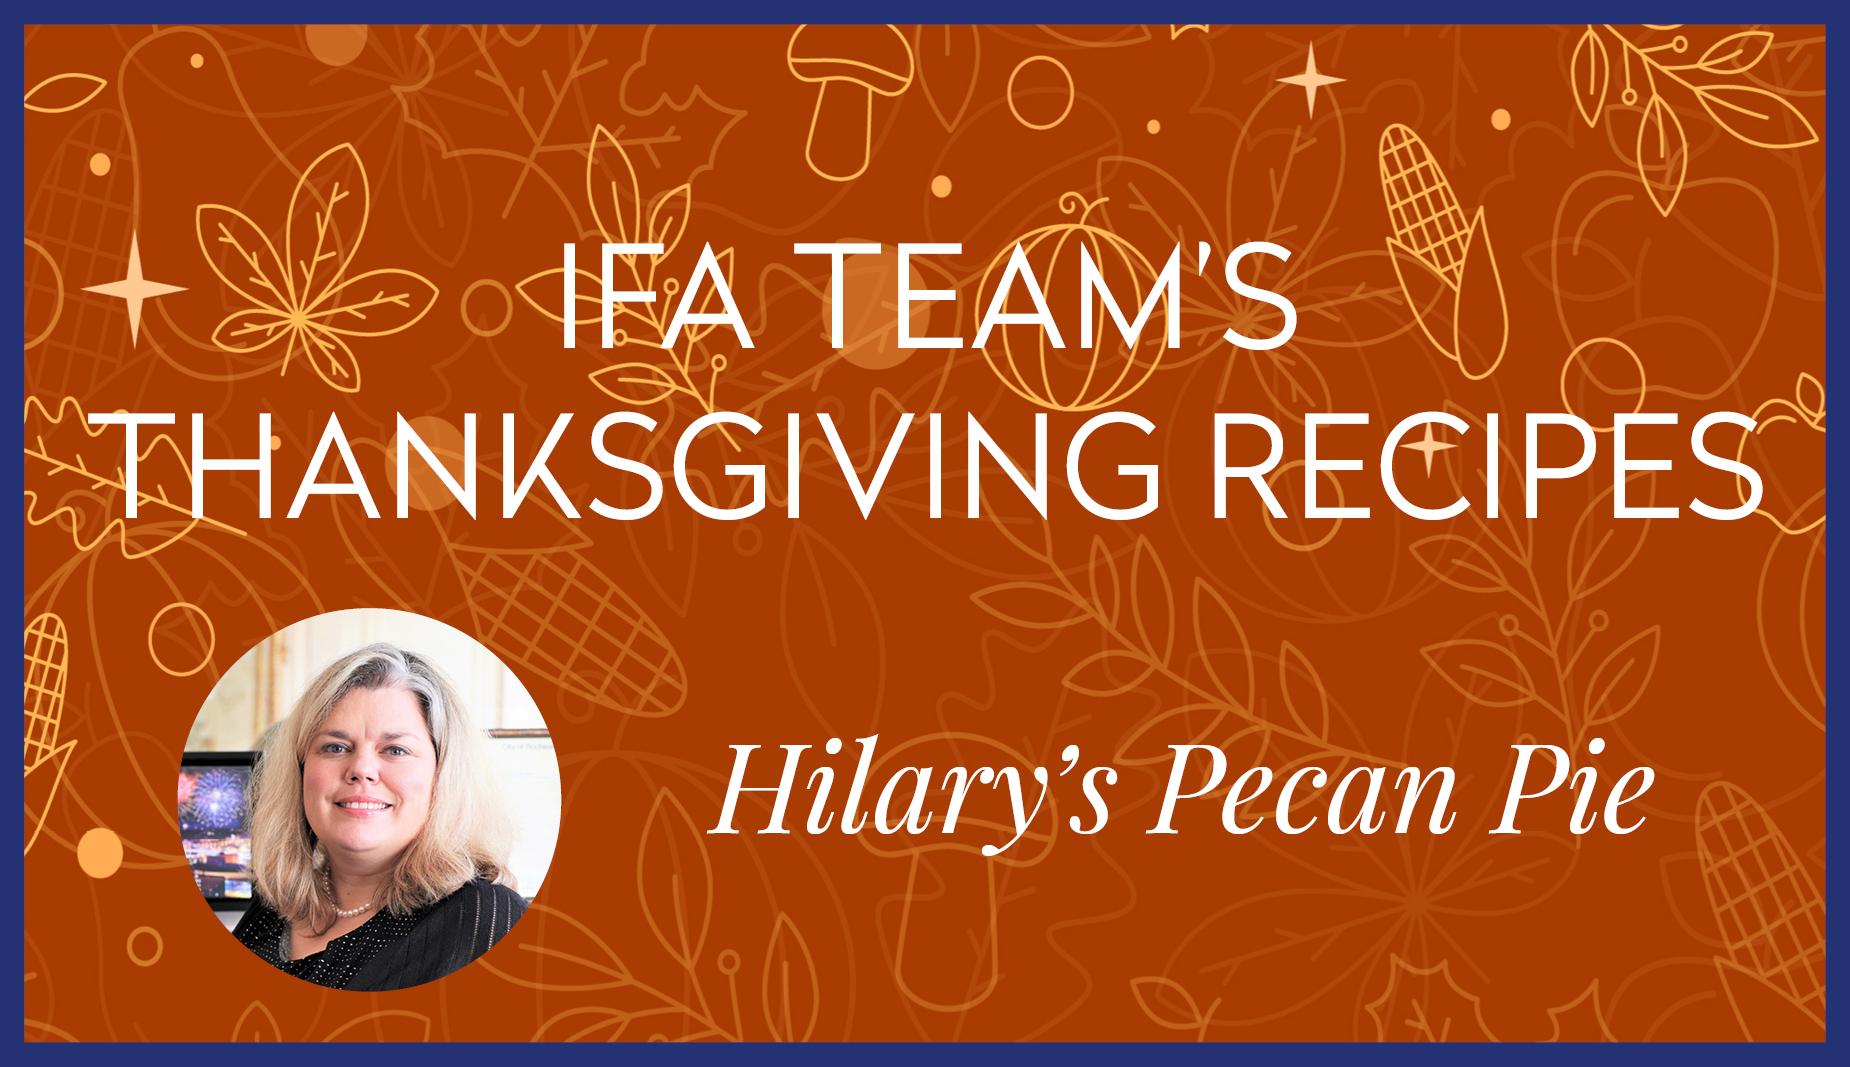 Hilary's Pecan Pie